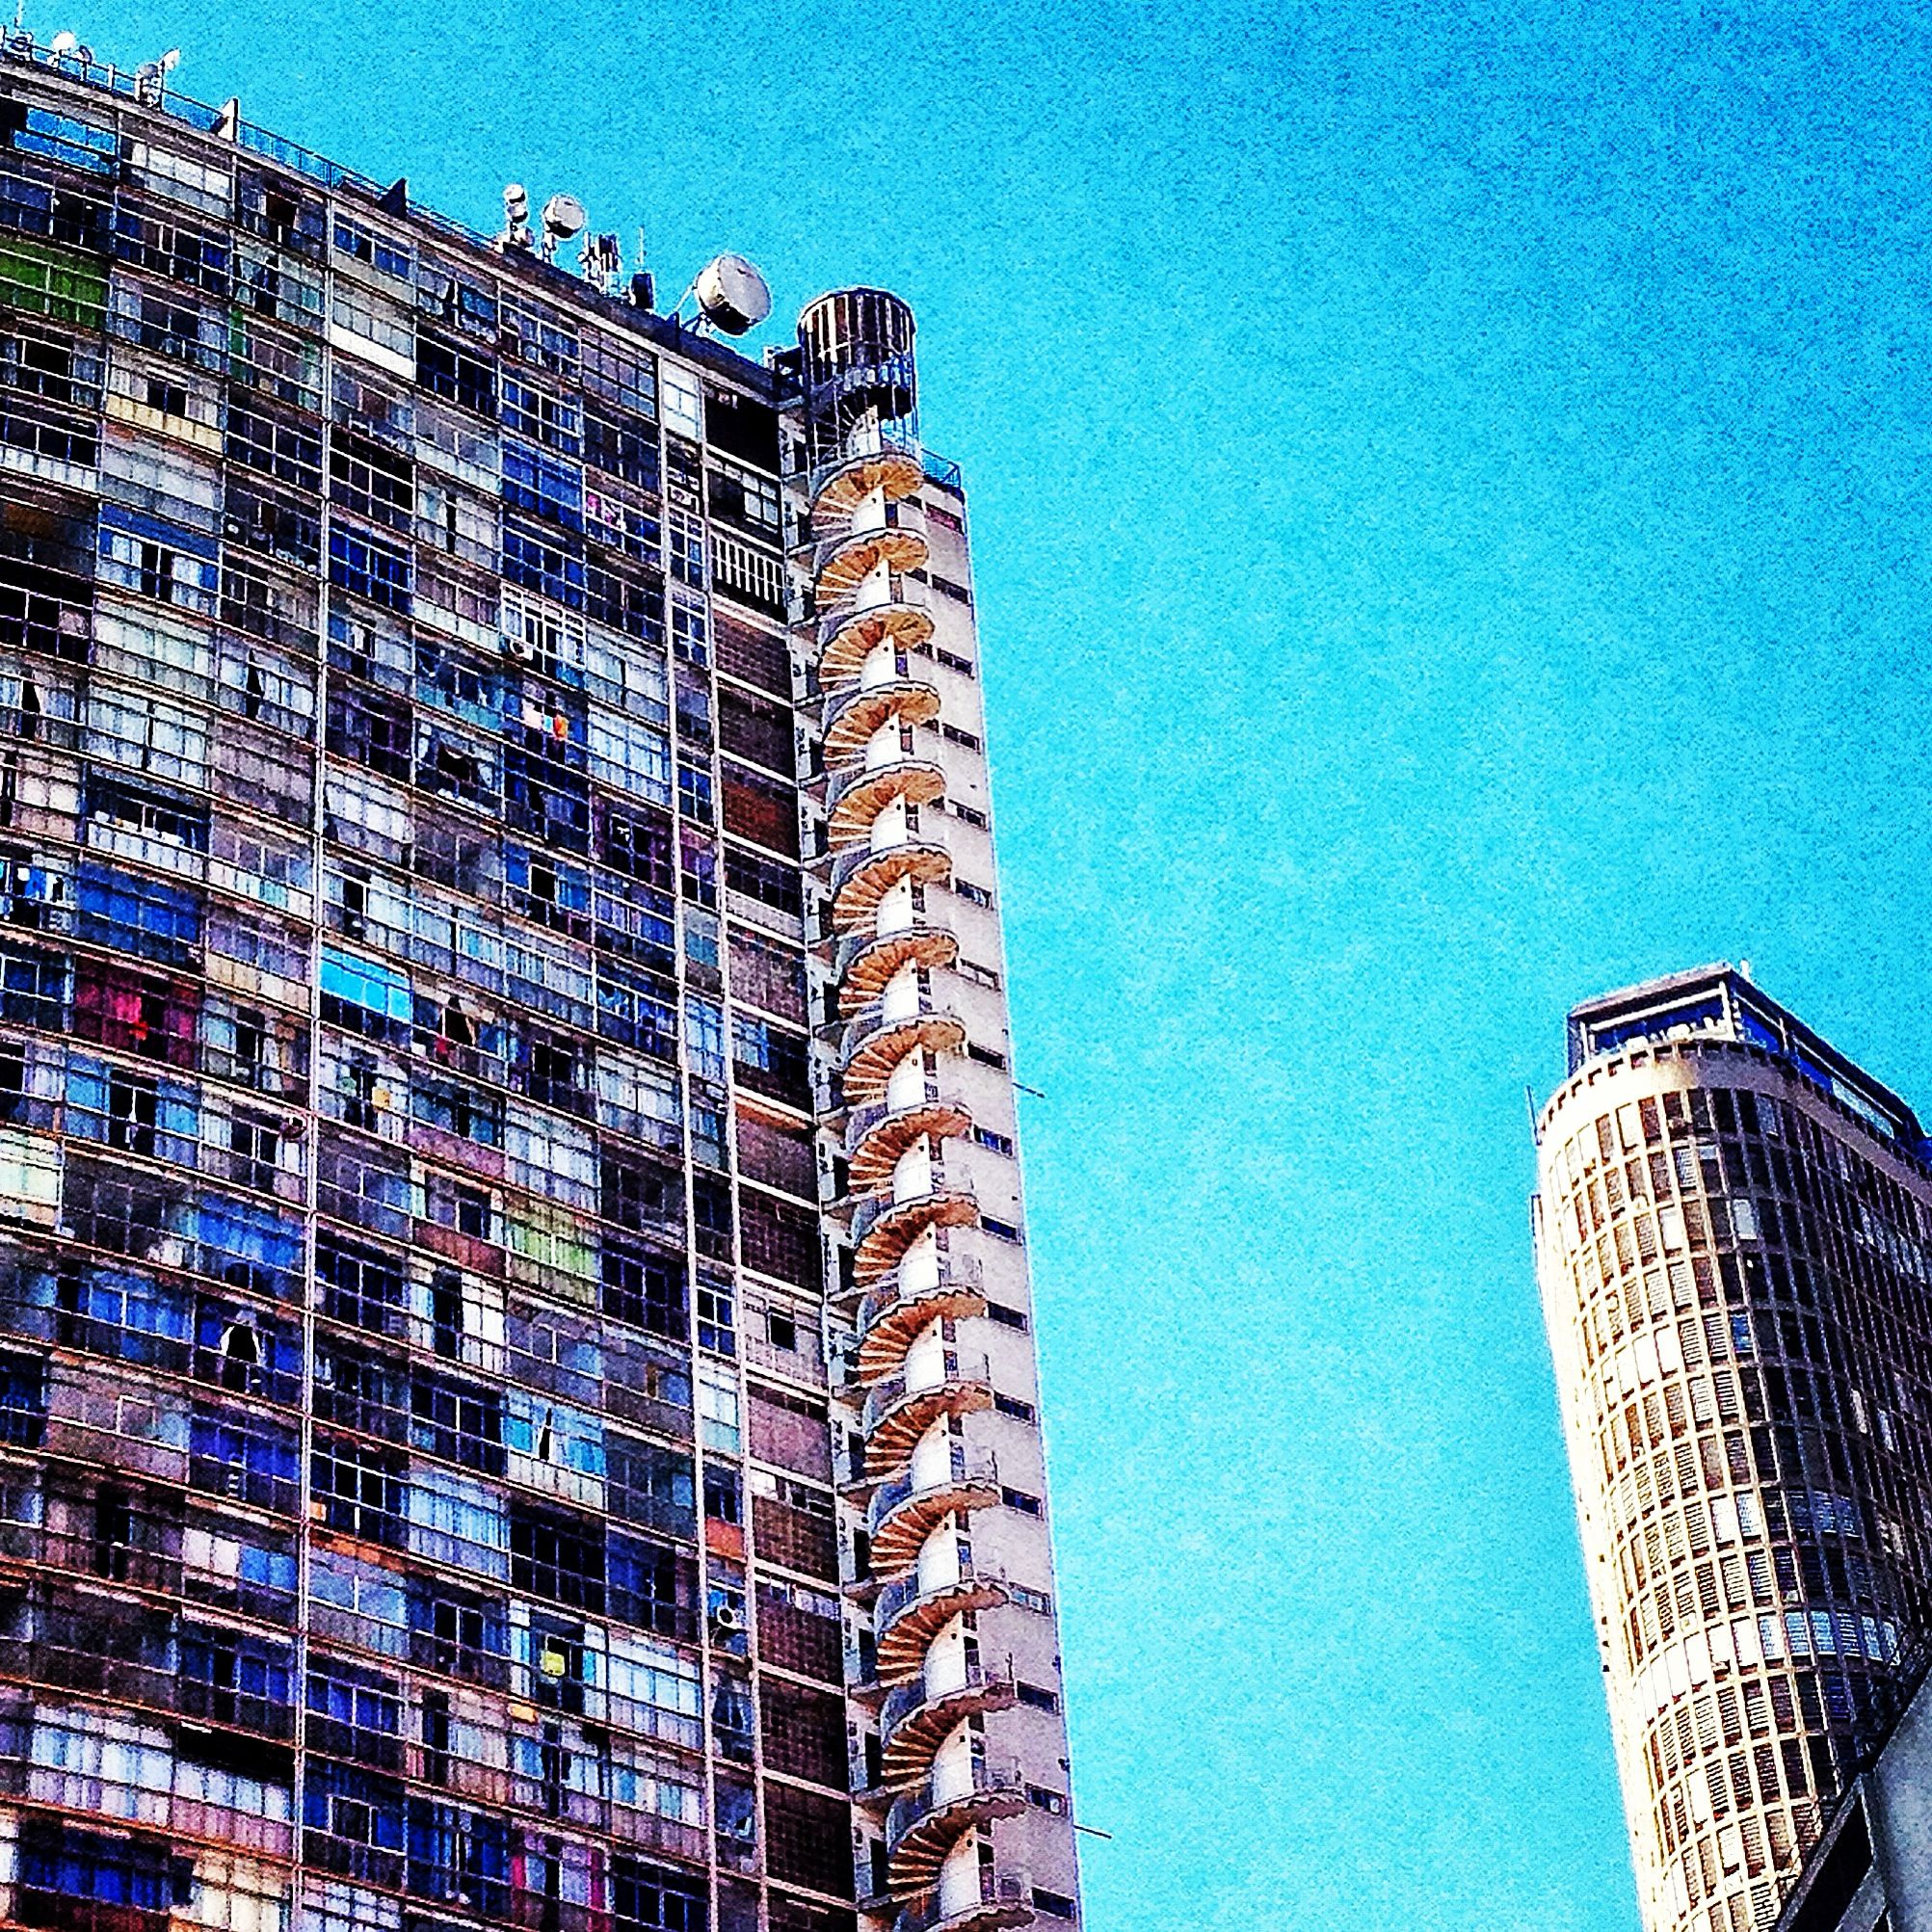 Copan and Ed Italia, Sao Paulo | The World as I see it